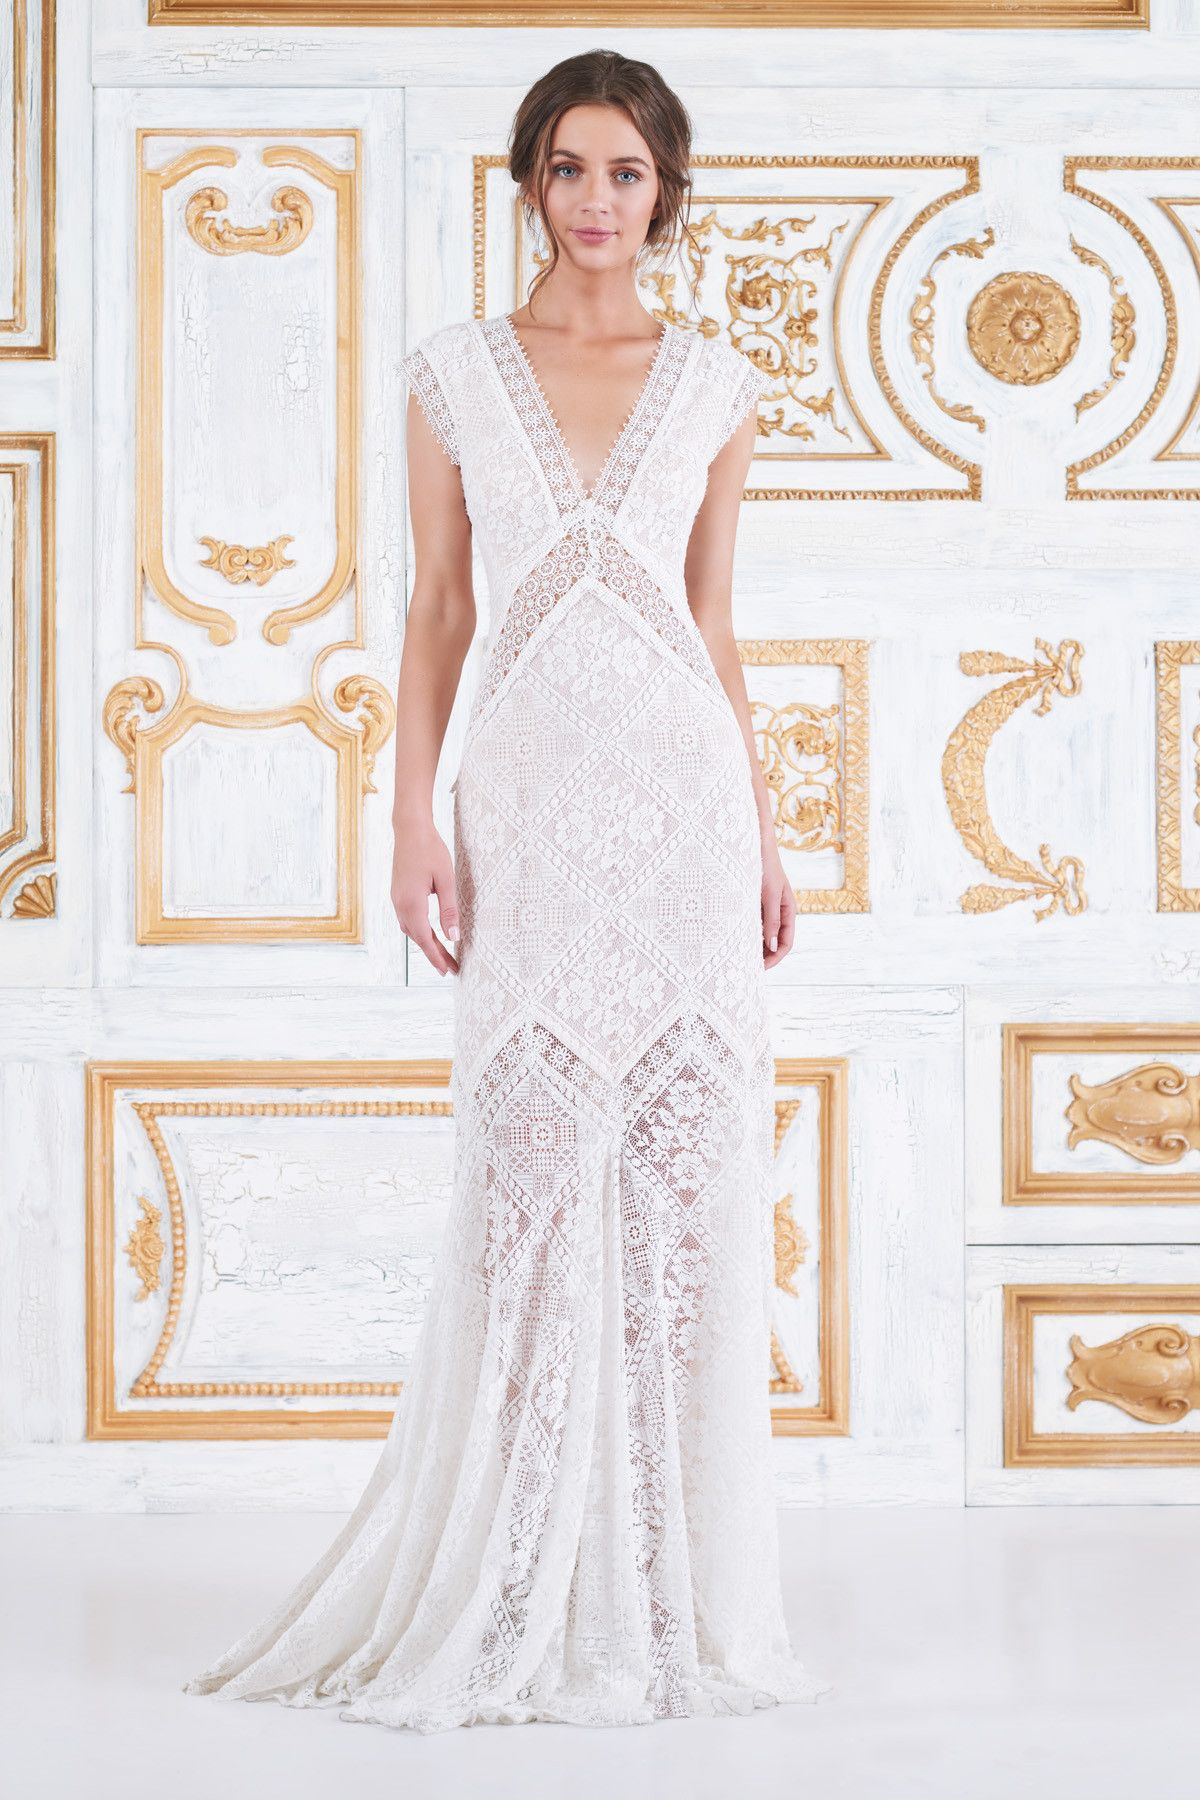 Tadashi Shoji Bridal - Arabella Gown | PS Erika\'s Wedding ...